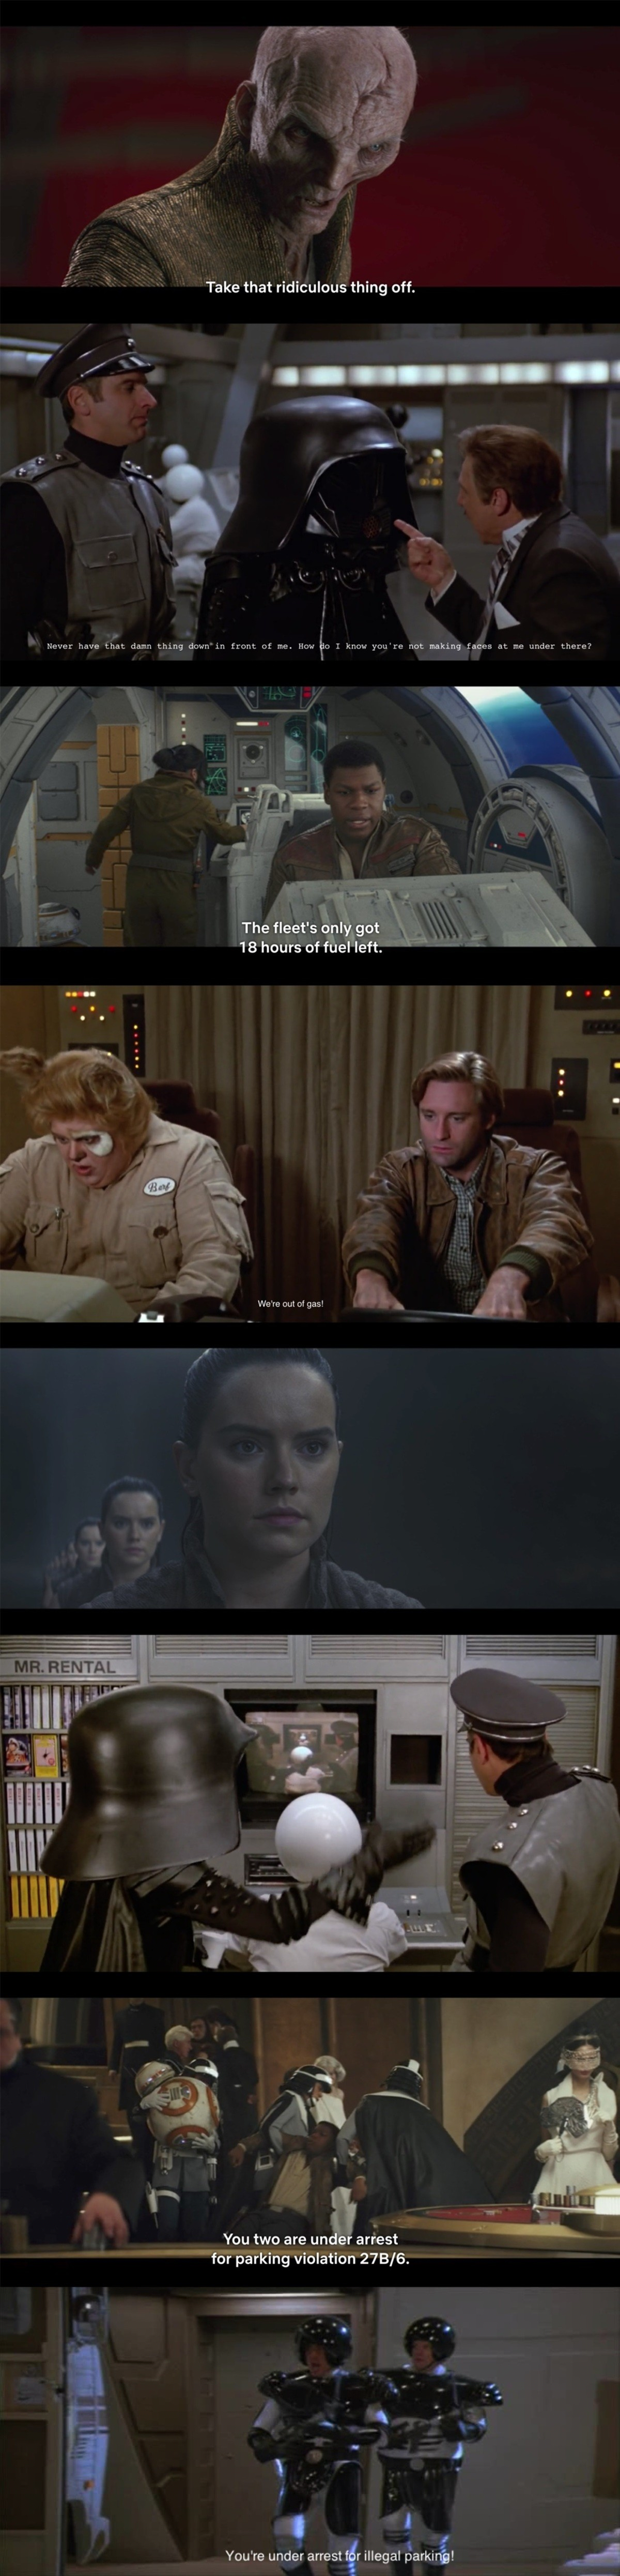 "Star Wars: The Last Spaceball. .. Starwars: ""We've lost site of them sir"" Spaceballs: ""We ain't found """